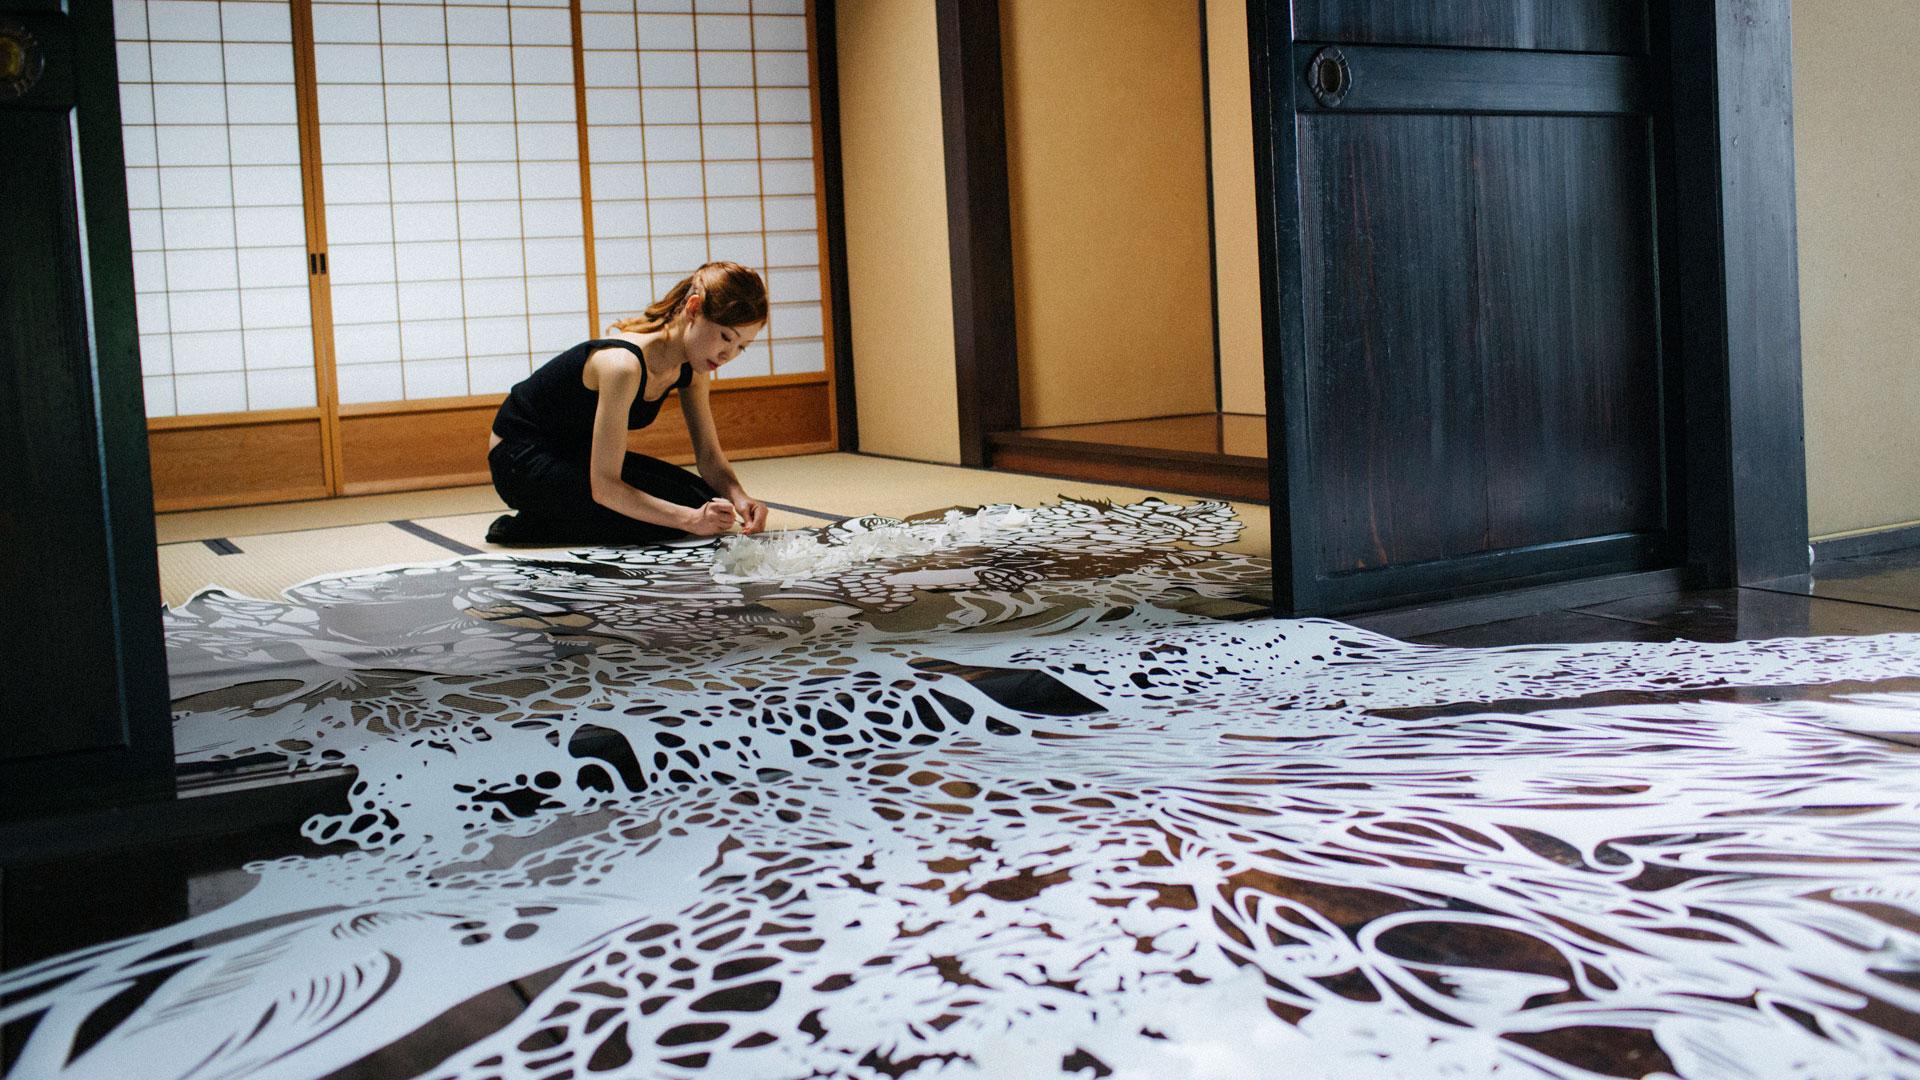 Imagen del documental Takumi producido por Lexus